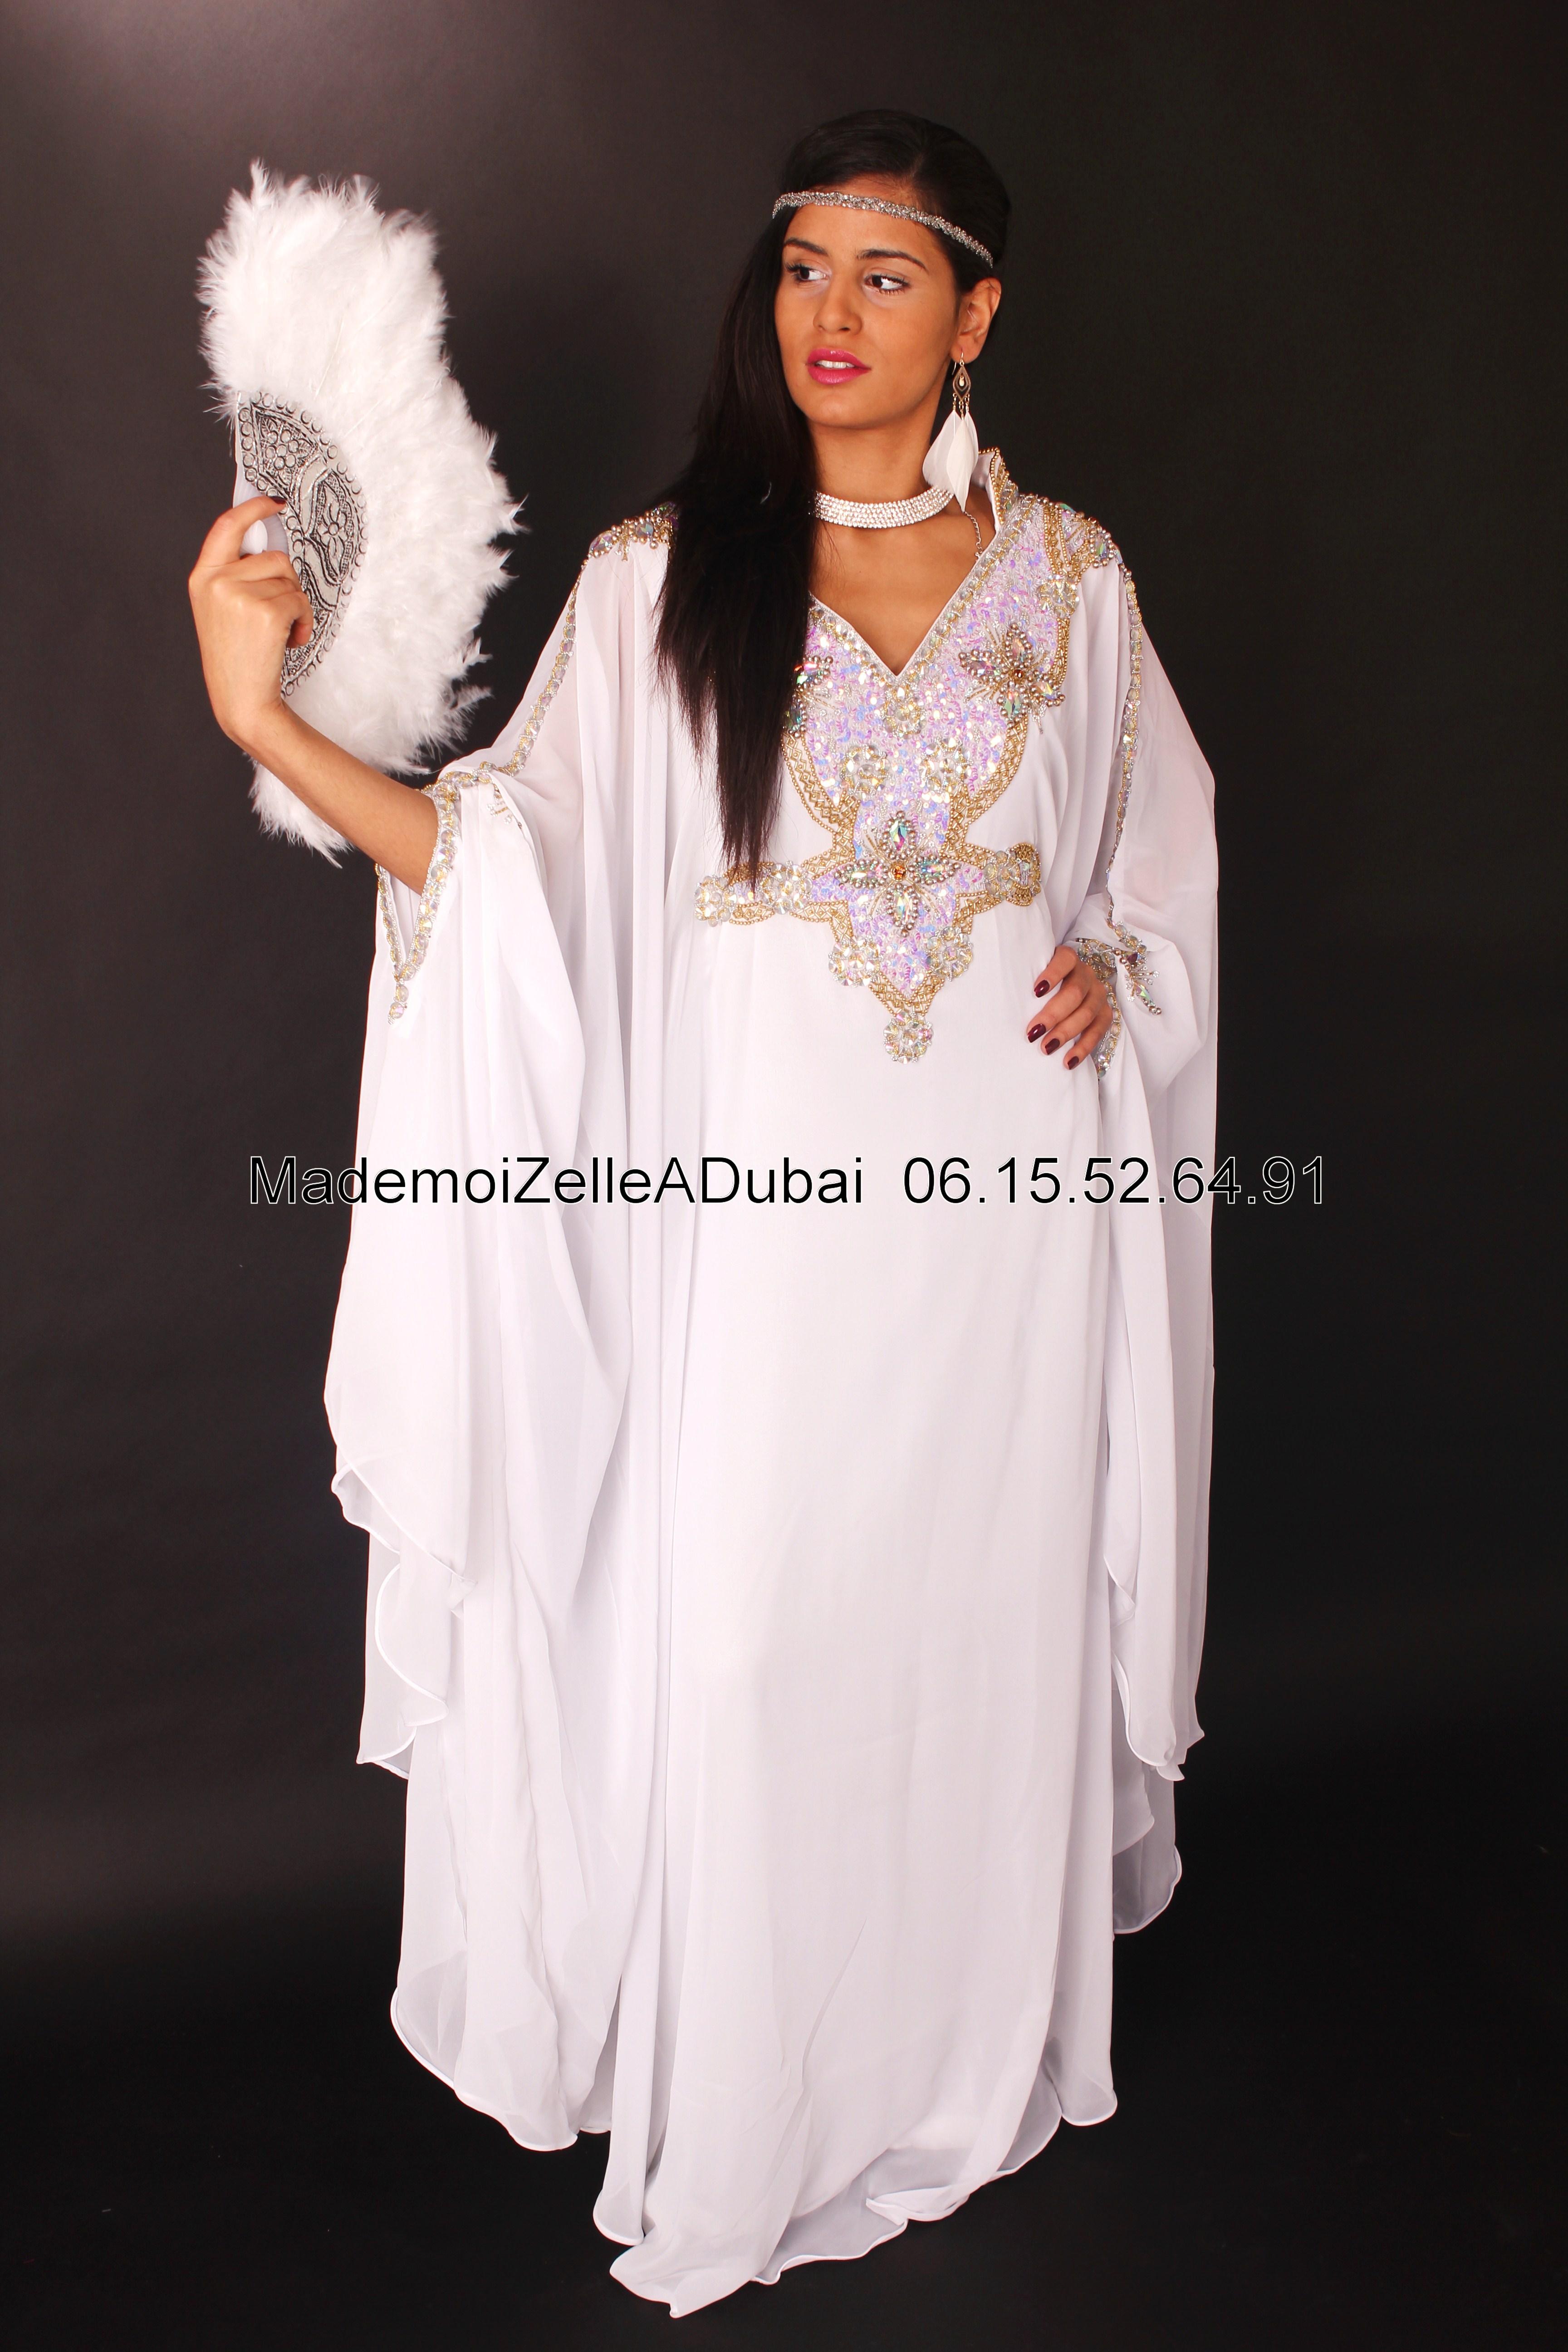 Pin negafa location robe soir mariage montekao genuardis for Boutique de location de robe de mariage dubai